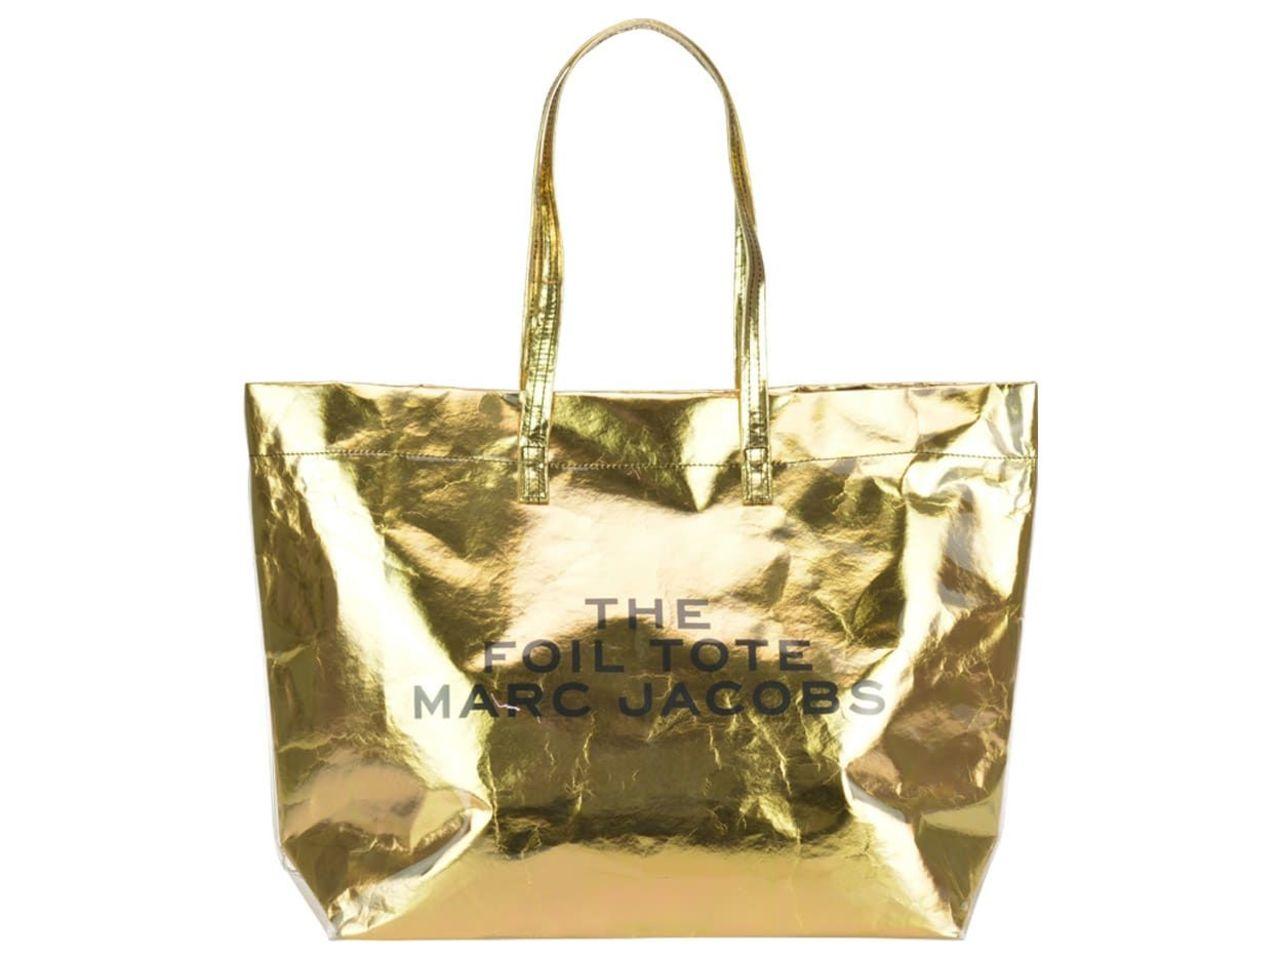 Marc Jacobs The Foil Tote Bag